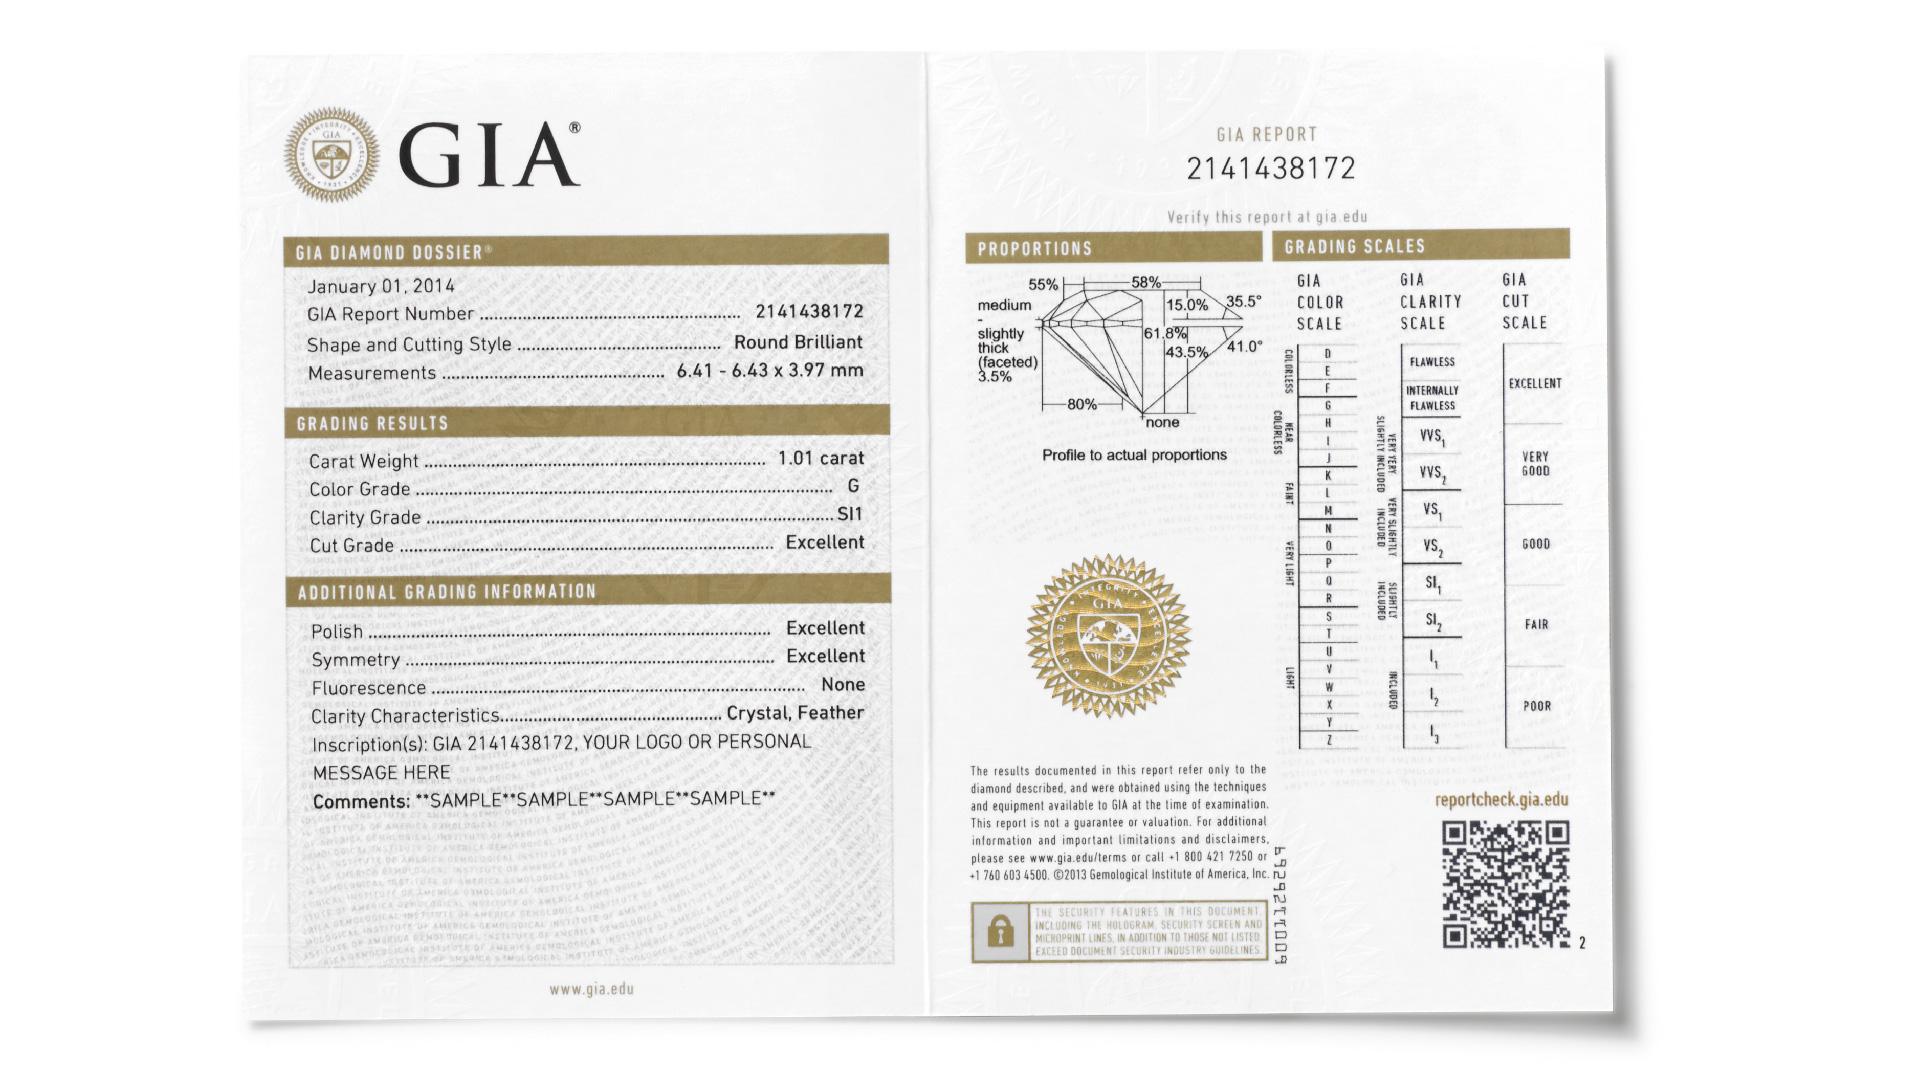 GIA 钻石鉴定精简版证书(GIA Diamond Dossier ®)包括 4C 标准的评估 — 颜色、净度、切工和克拉重量 — 并用镭射微刻技术在钻石腰围刻上证书编号,以便轻松识别。